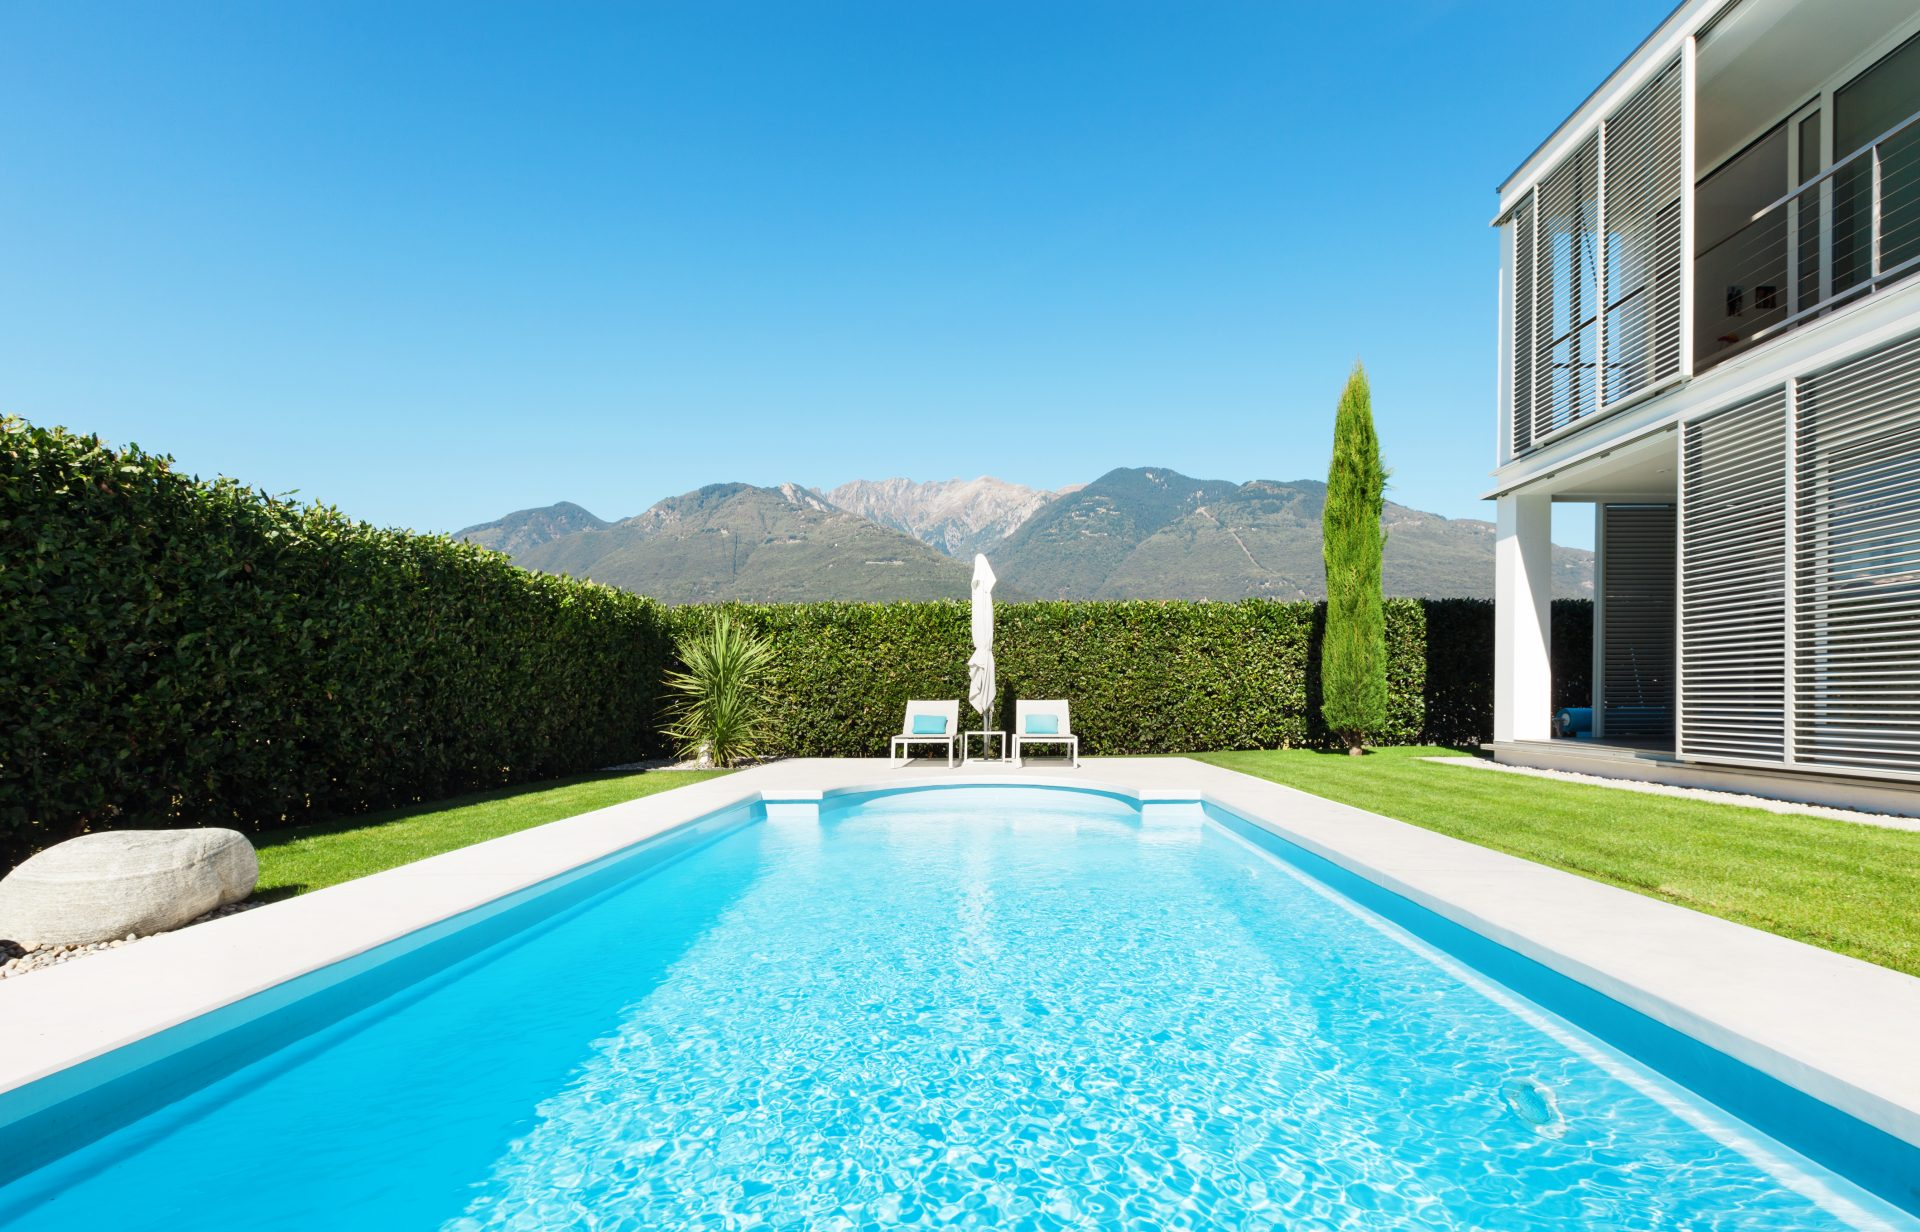 piscine coque acrylique